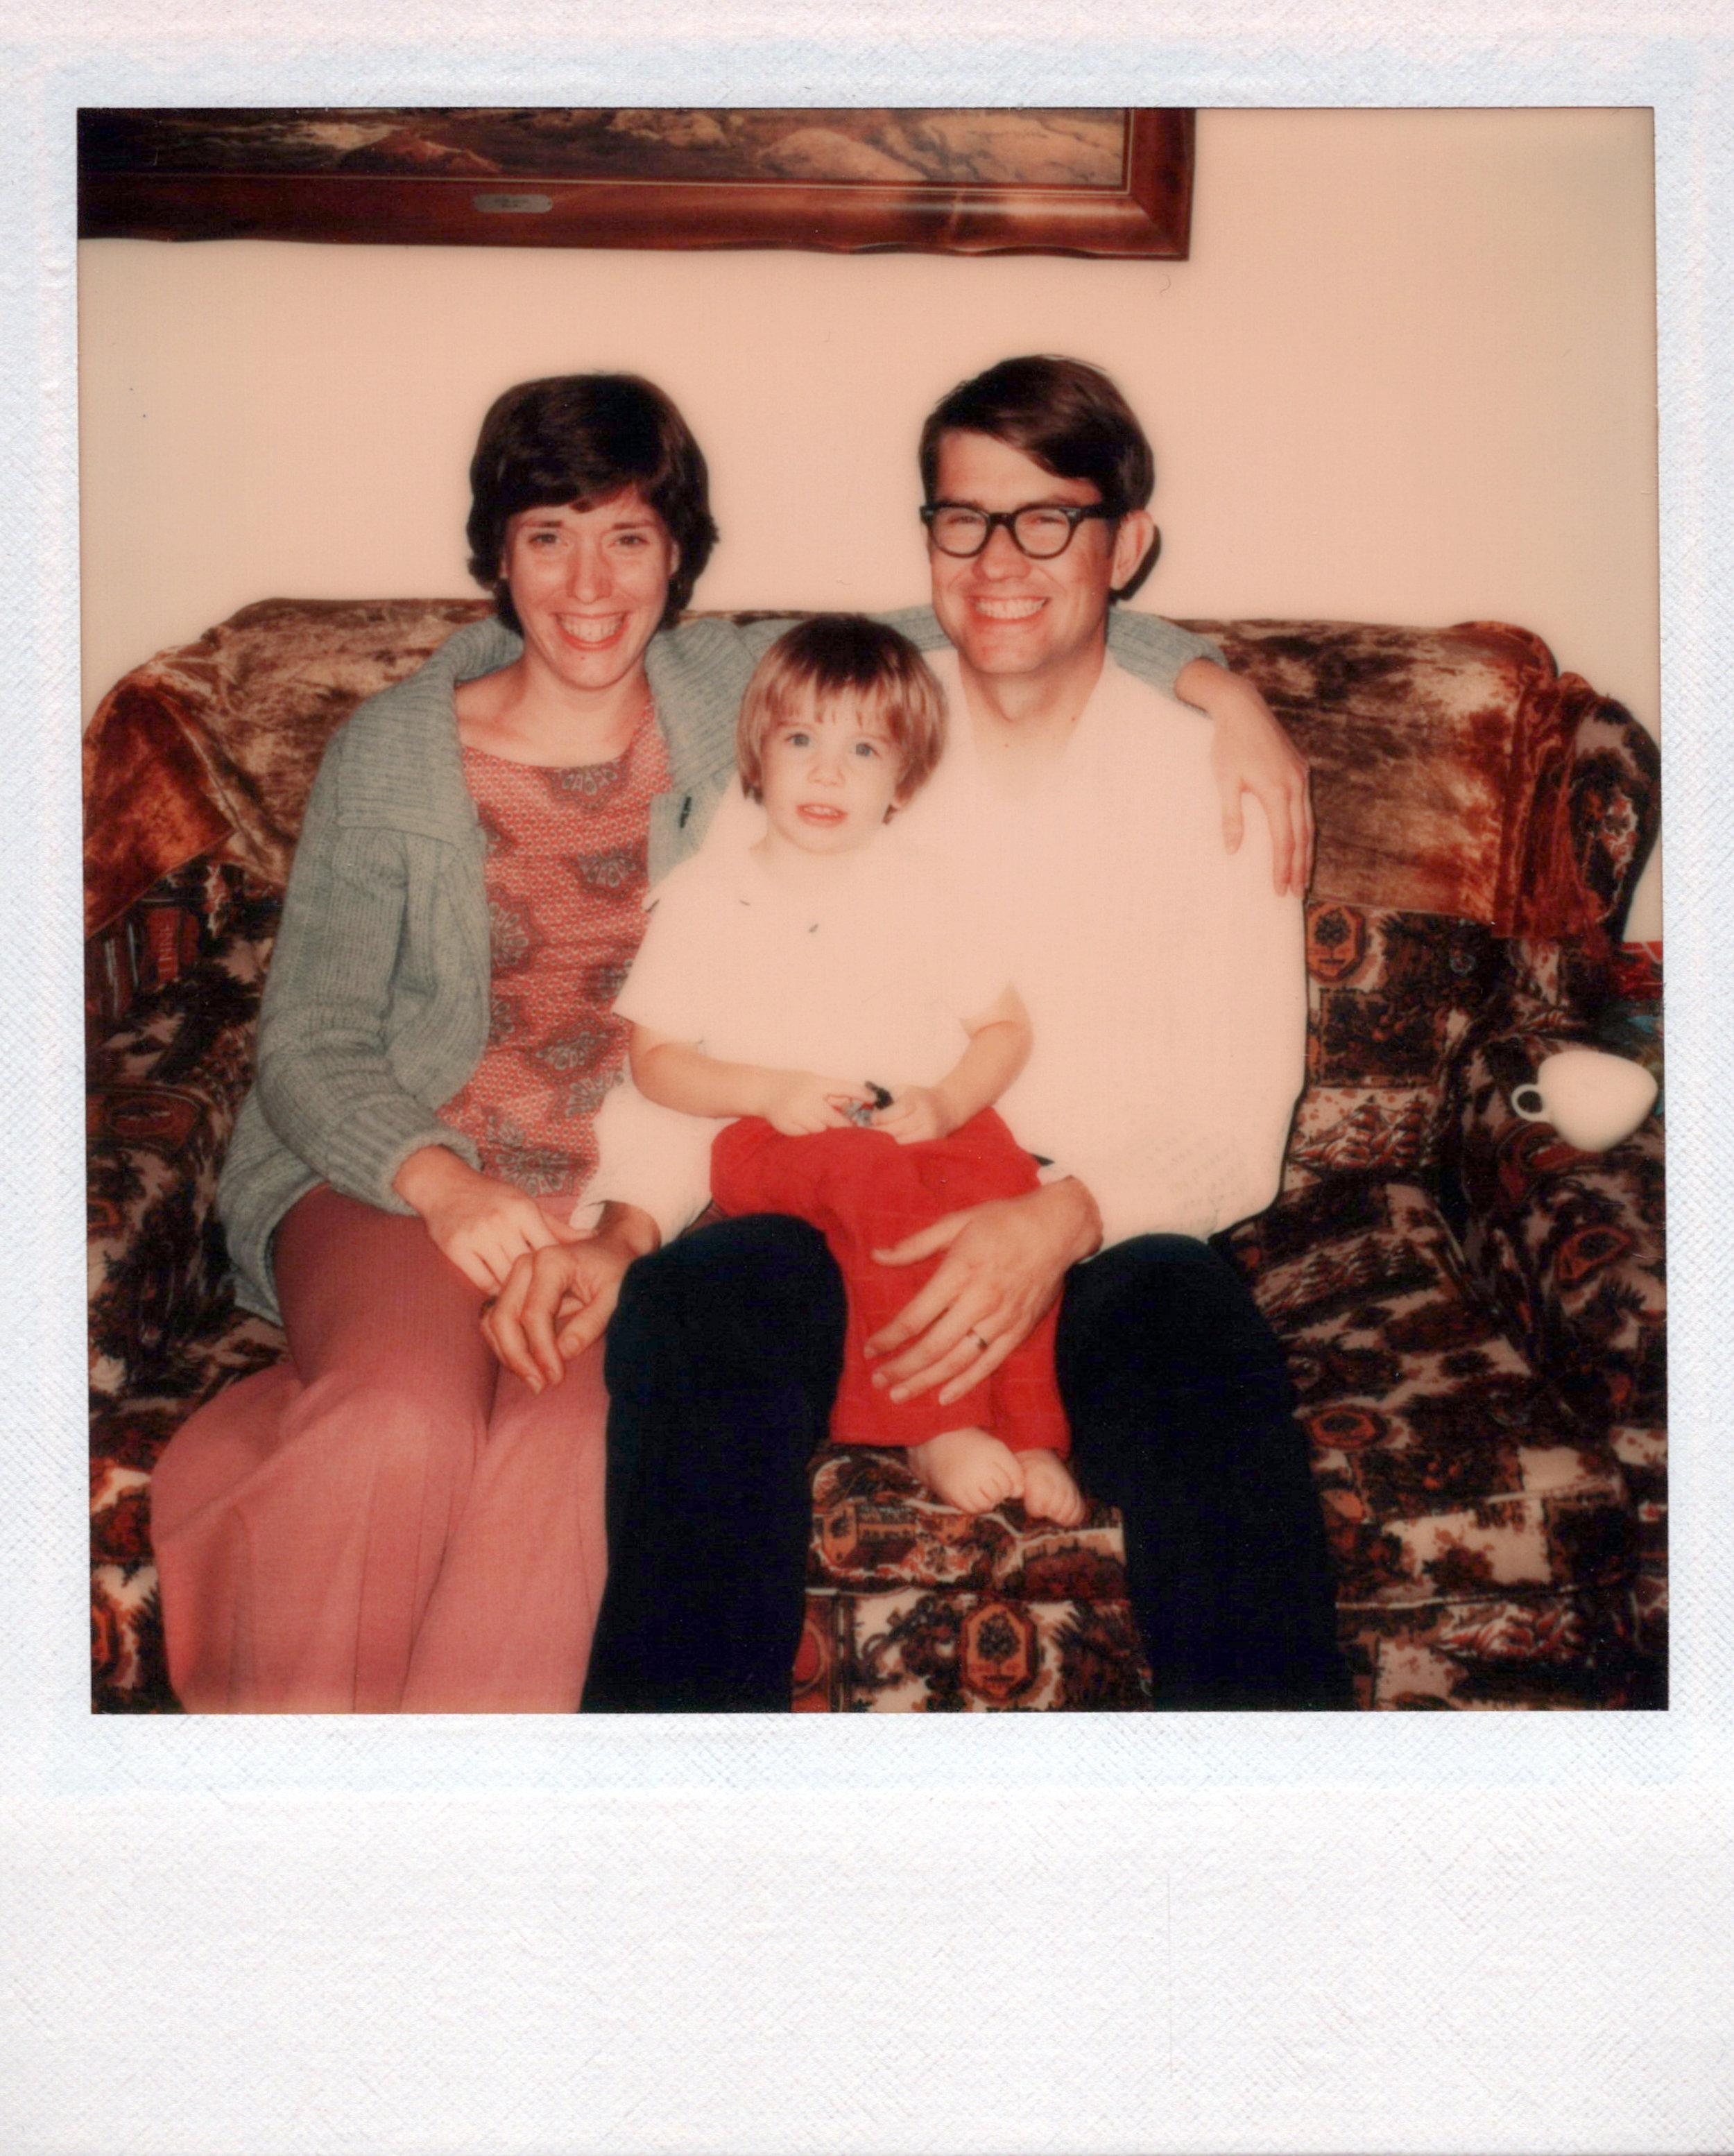 1970S_PHOTO_GODFREY-OROSI_0005_a.jpg